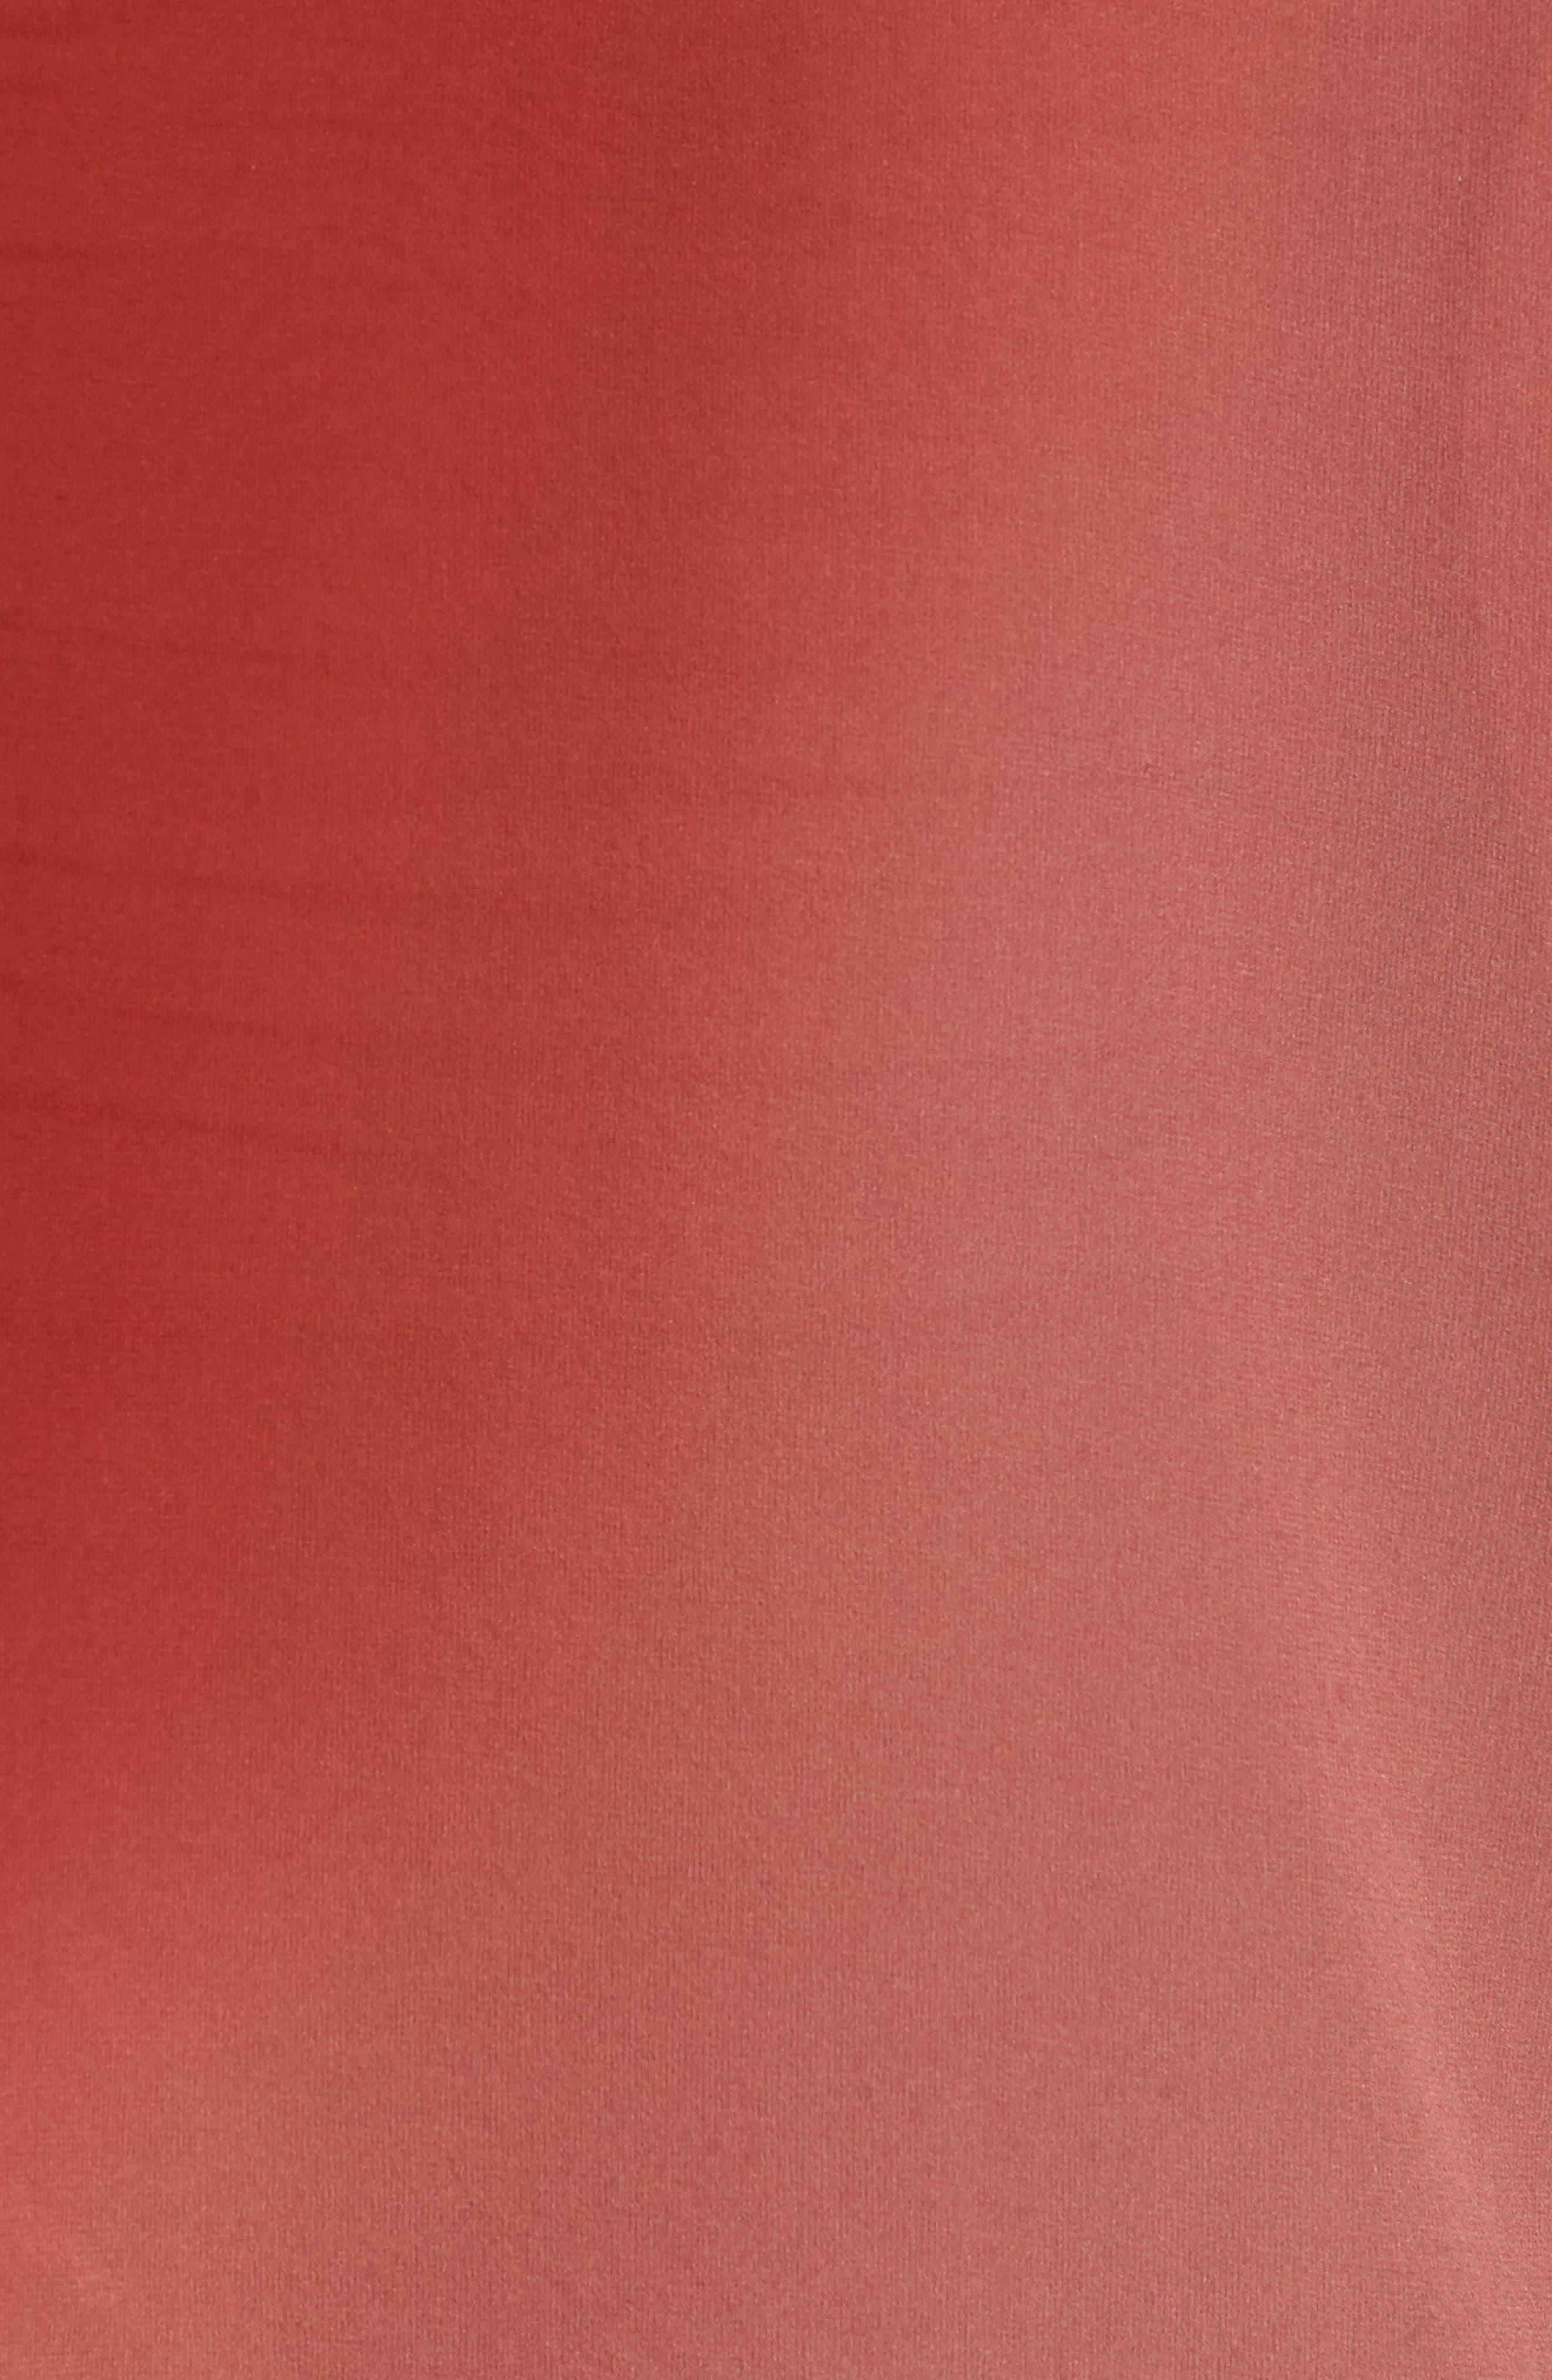 Ombré Silk Short Sleeve Top,                             Alternate thumbnail 5, color,                             Serrano